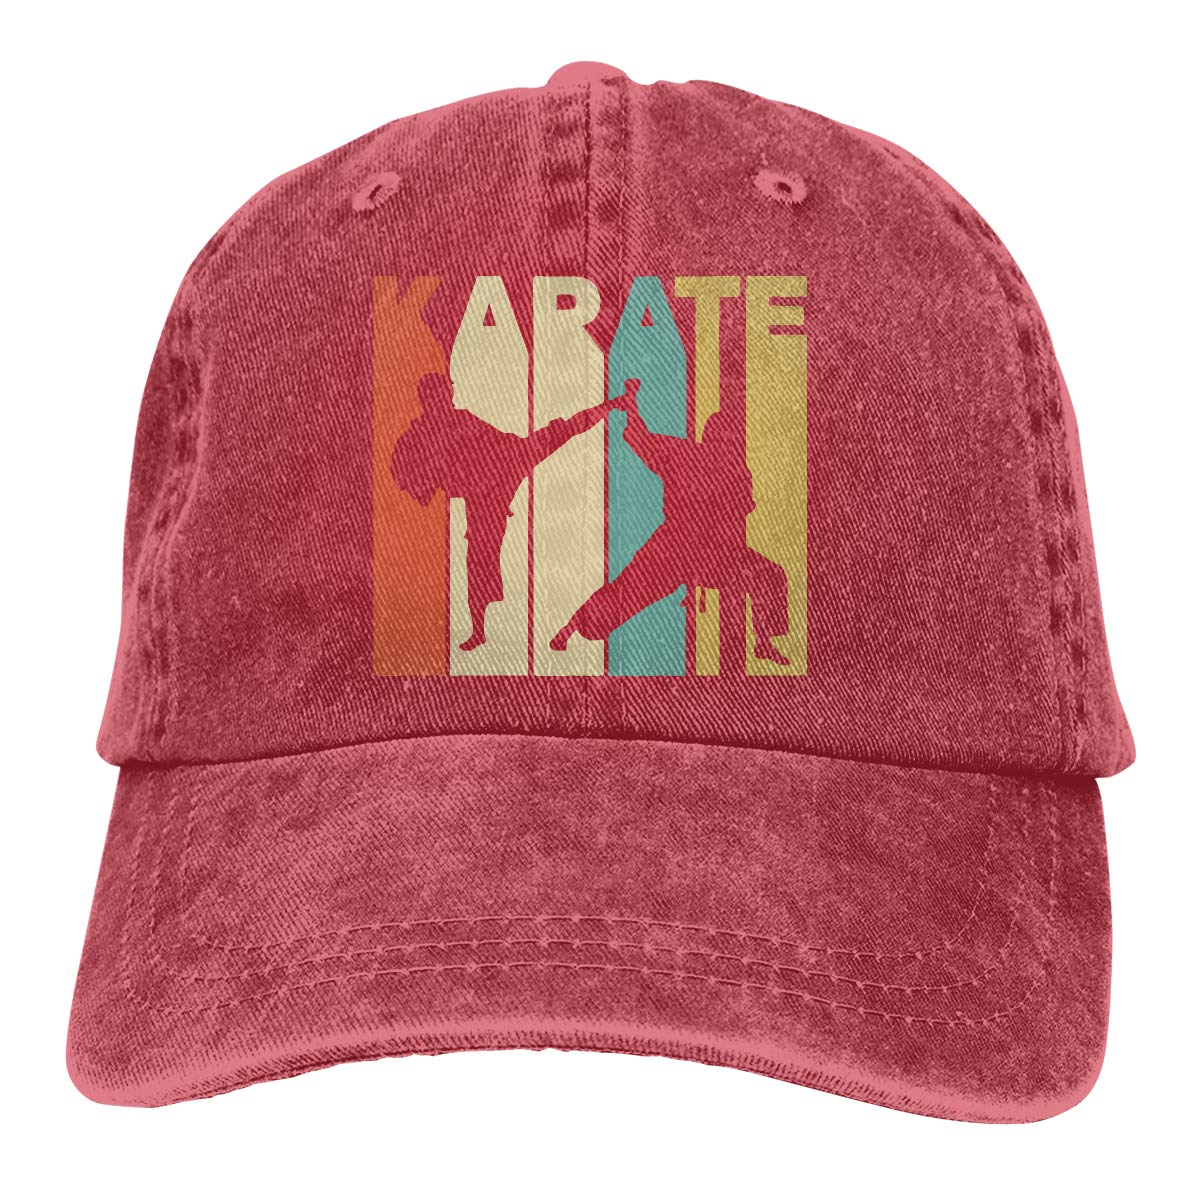 Vintage Style Karate Adult Custom Cowboy Outdoor Sports Hat Adjustable Baseball Cap